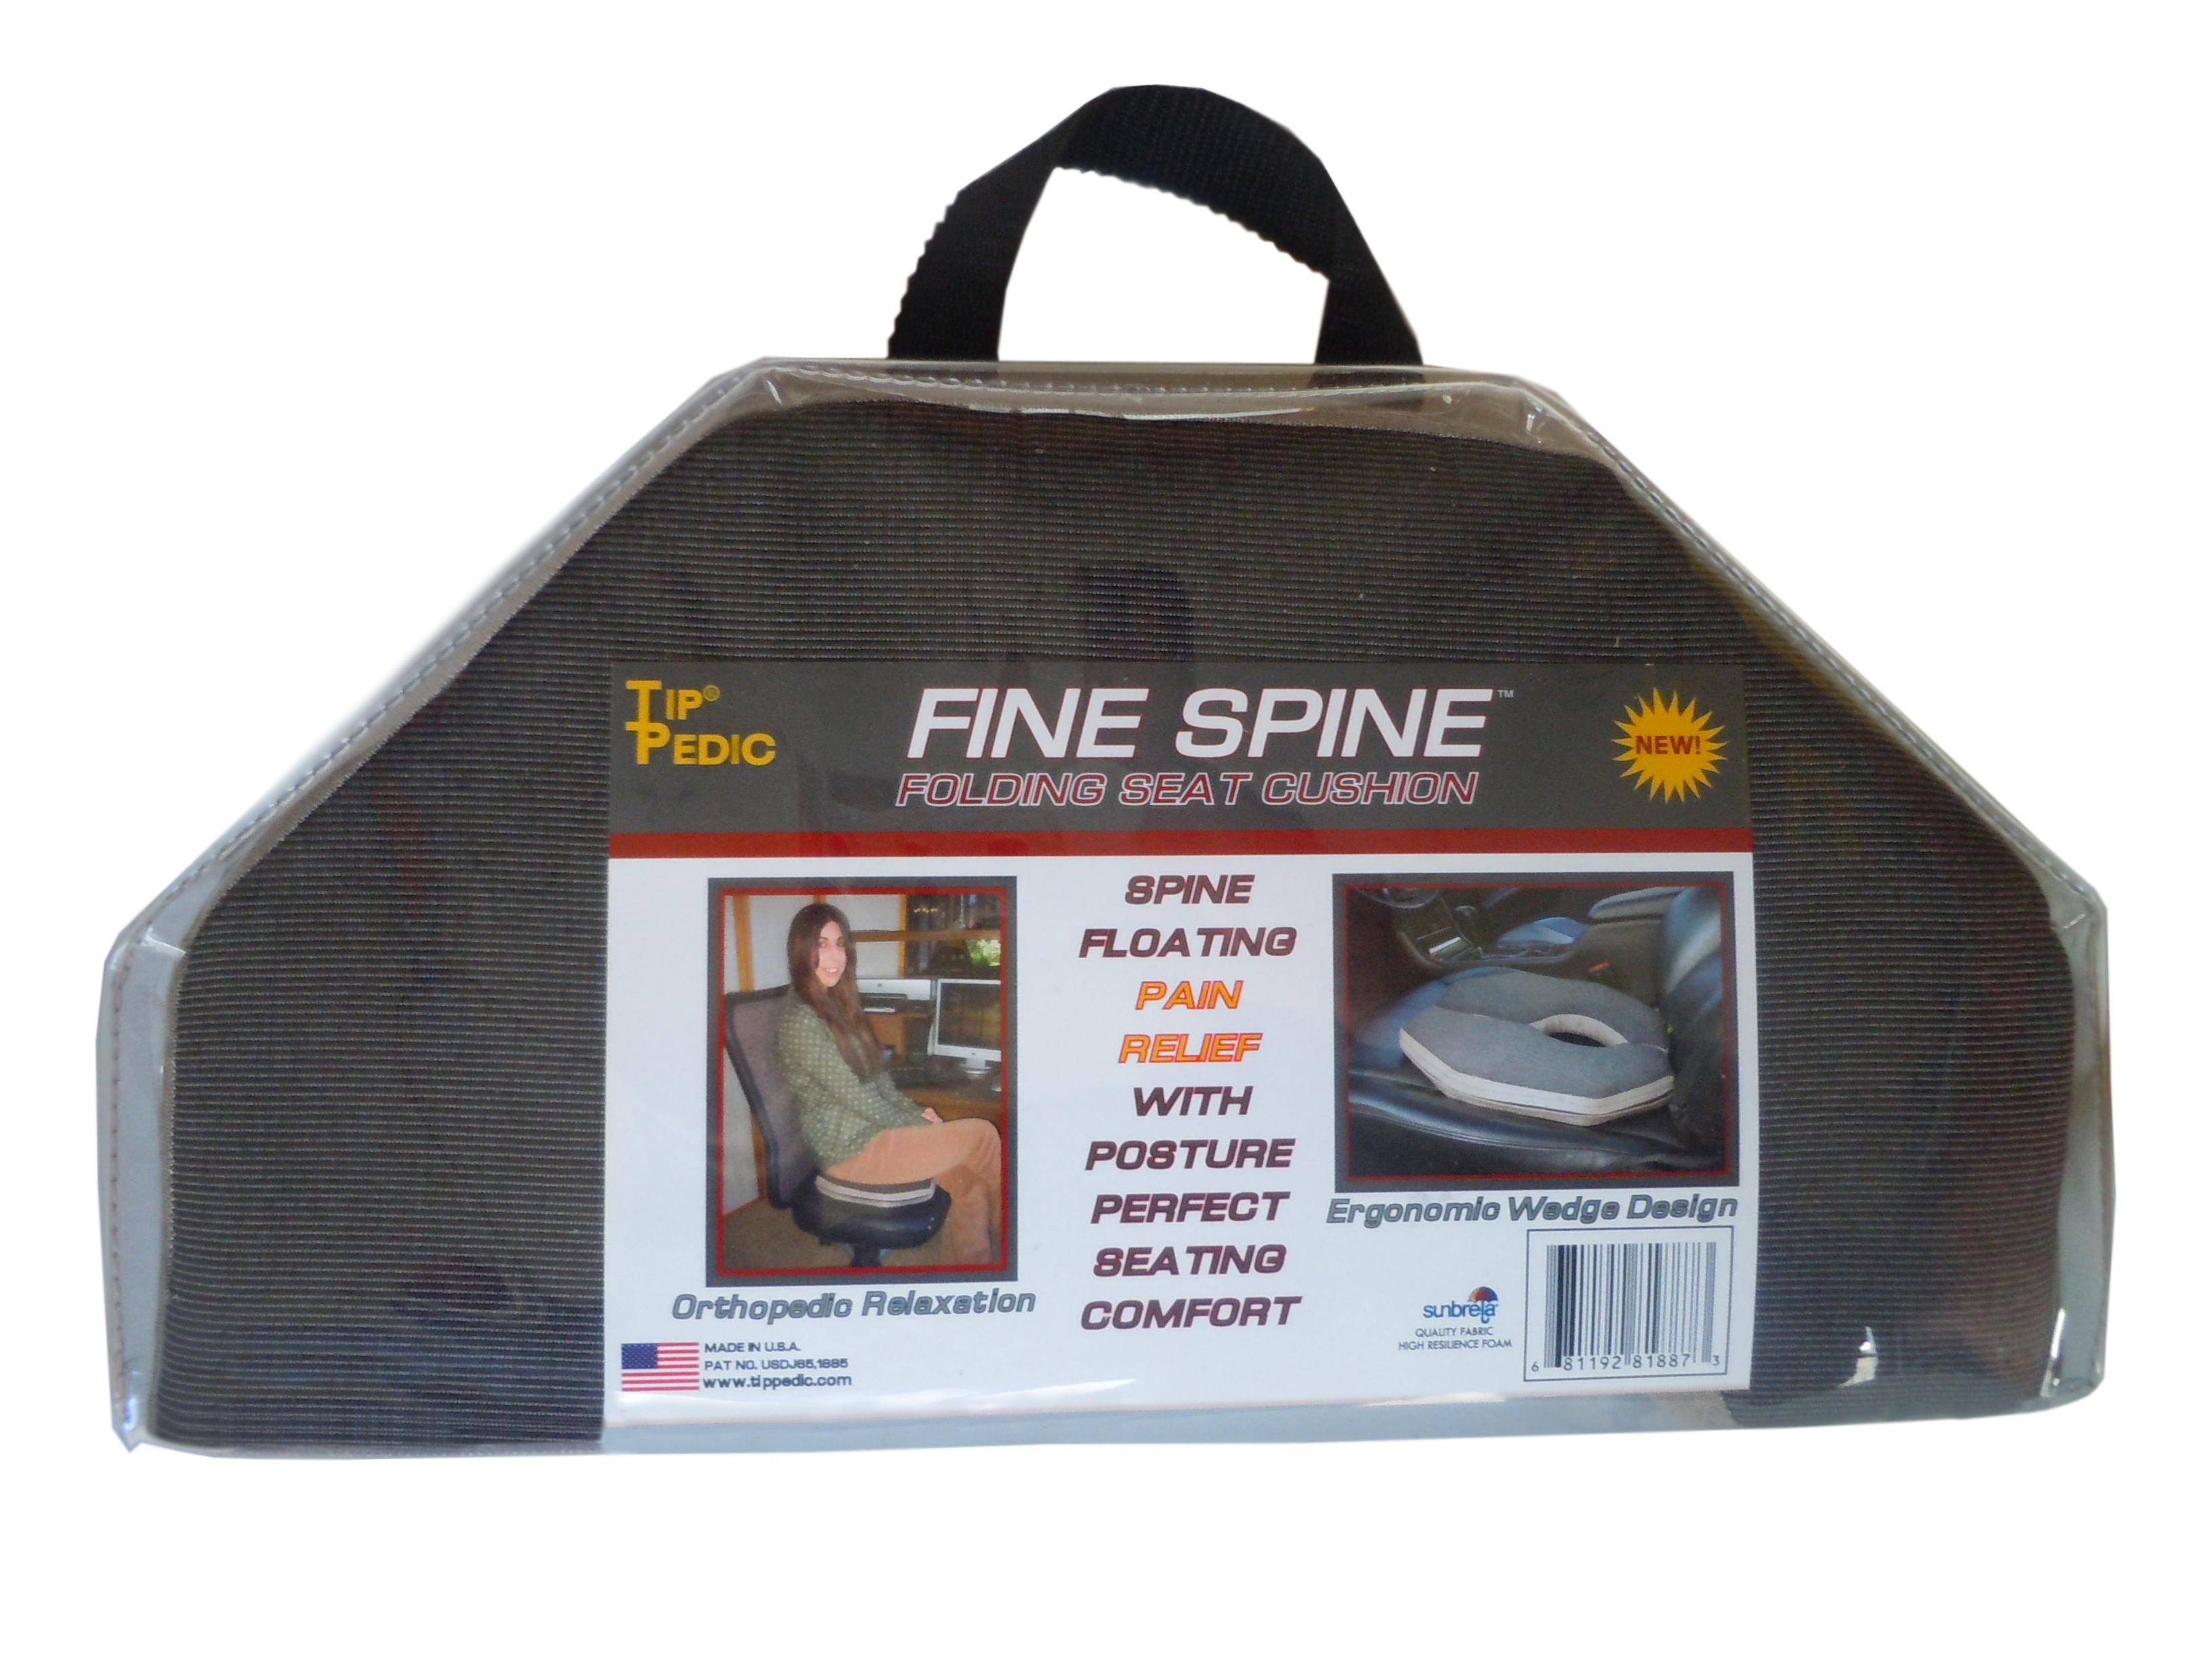 Fine Spine Flex Cushion sold by Tip Pedic on Storenvy